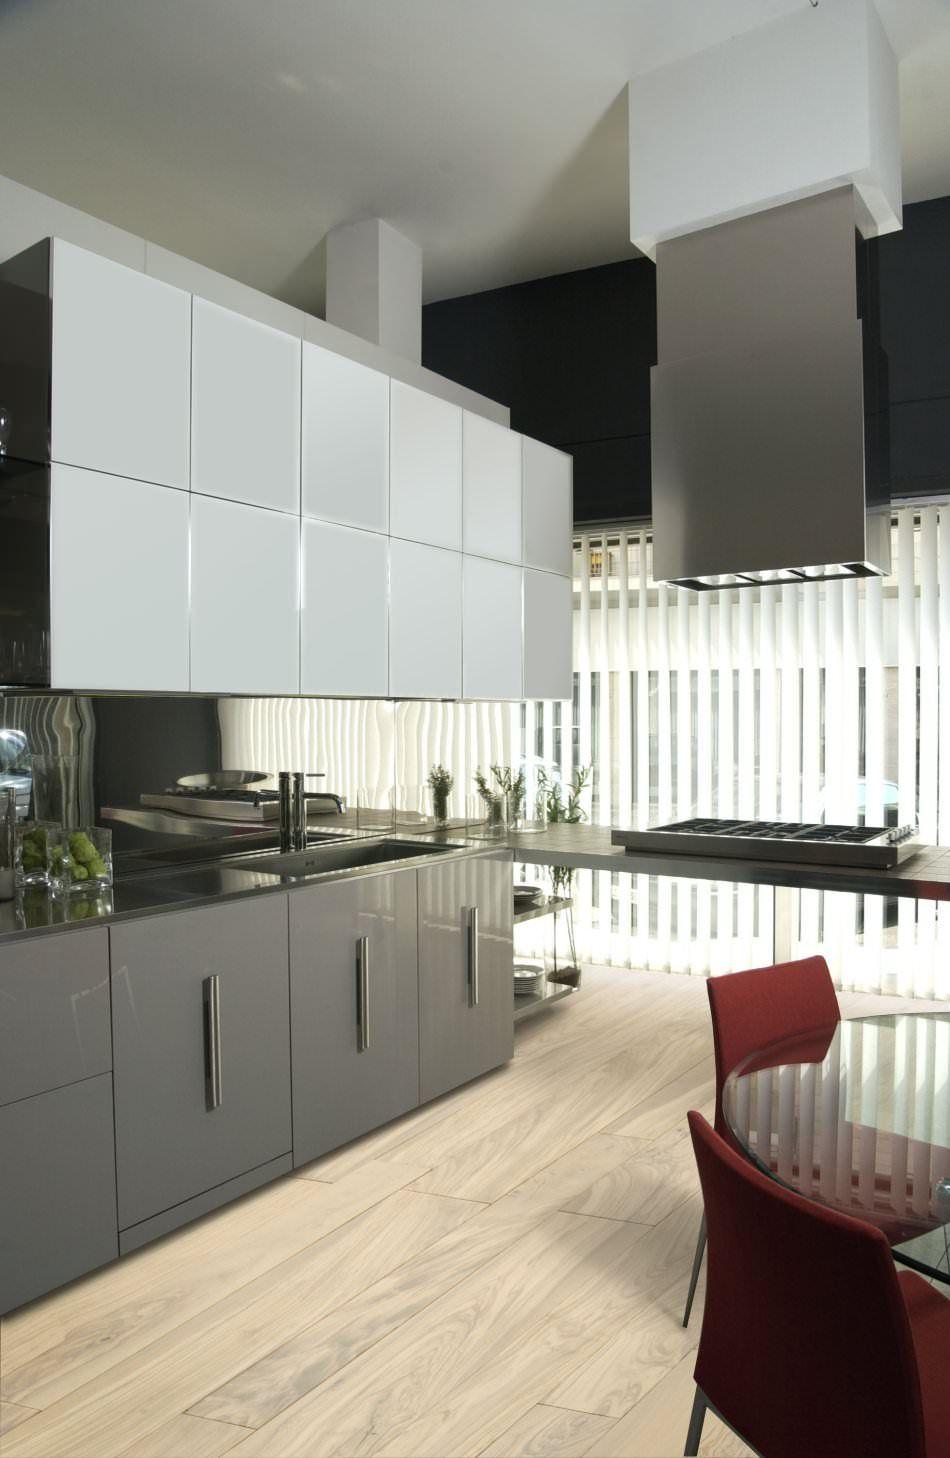 RAL 7037 Dusty Grey - High Gloss | Kitchen design | Pinterest | High ...